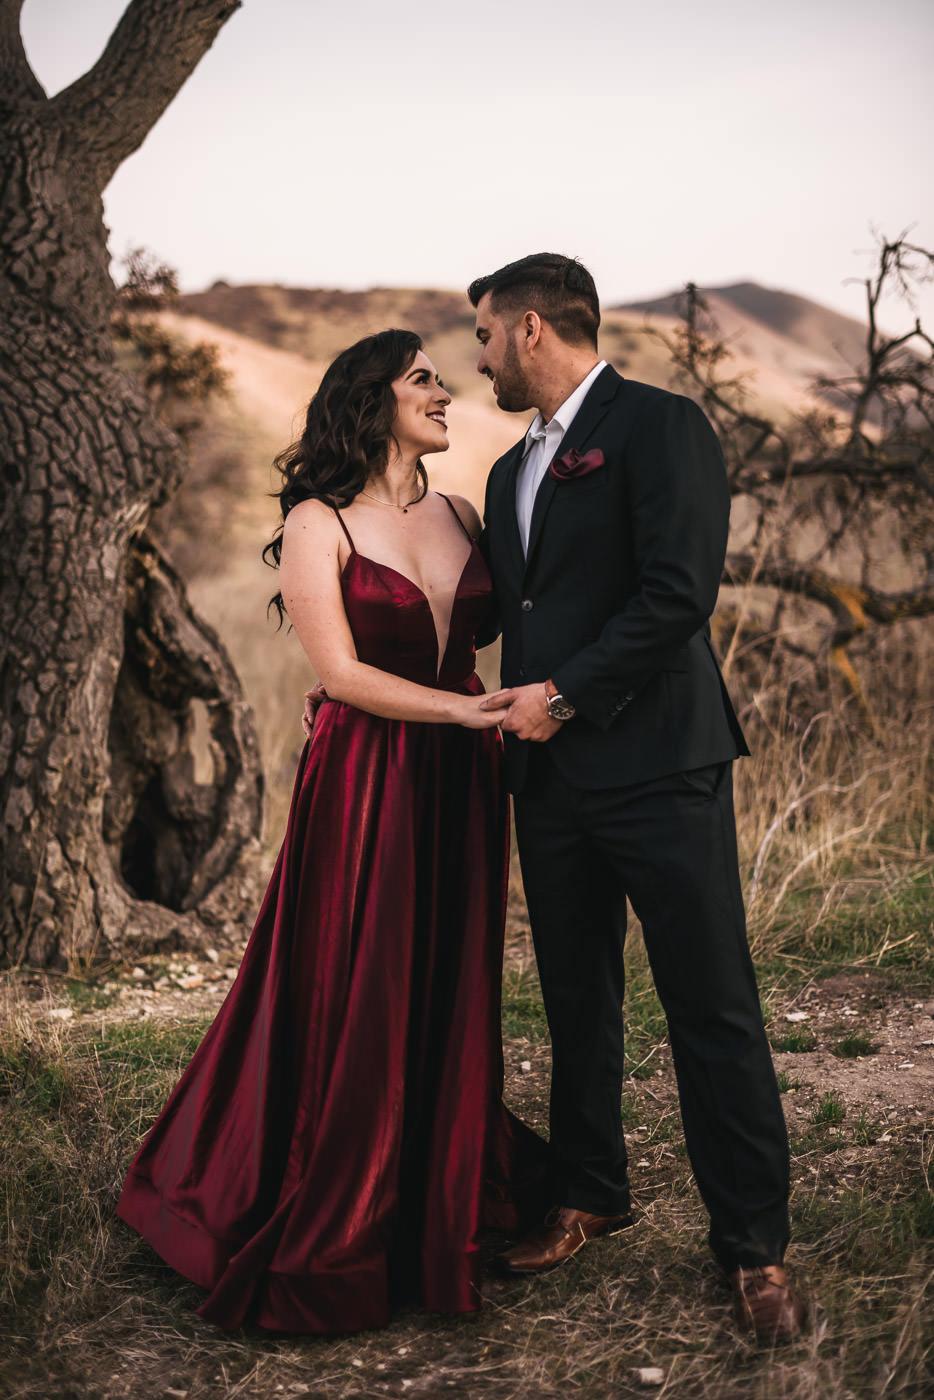 Beautiful engagement photography in Malibu California.